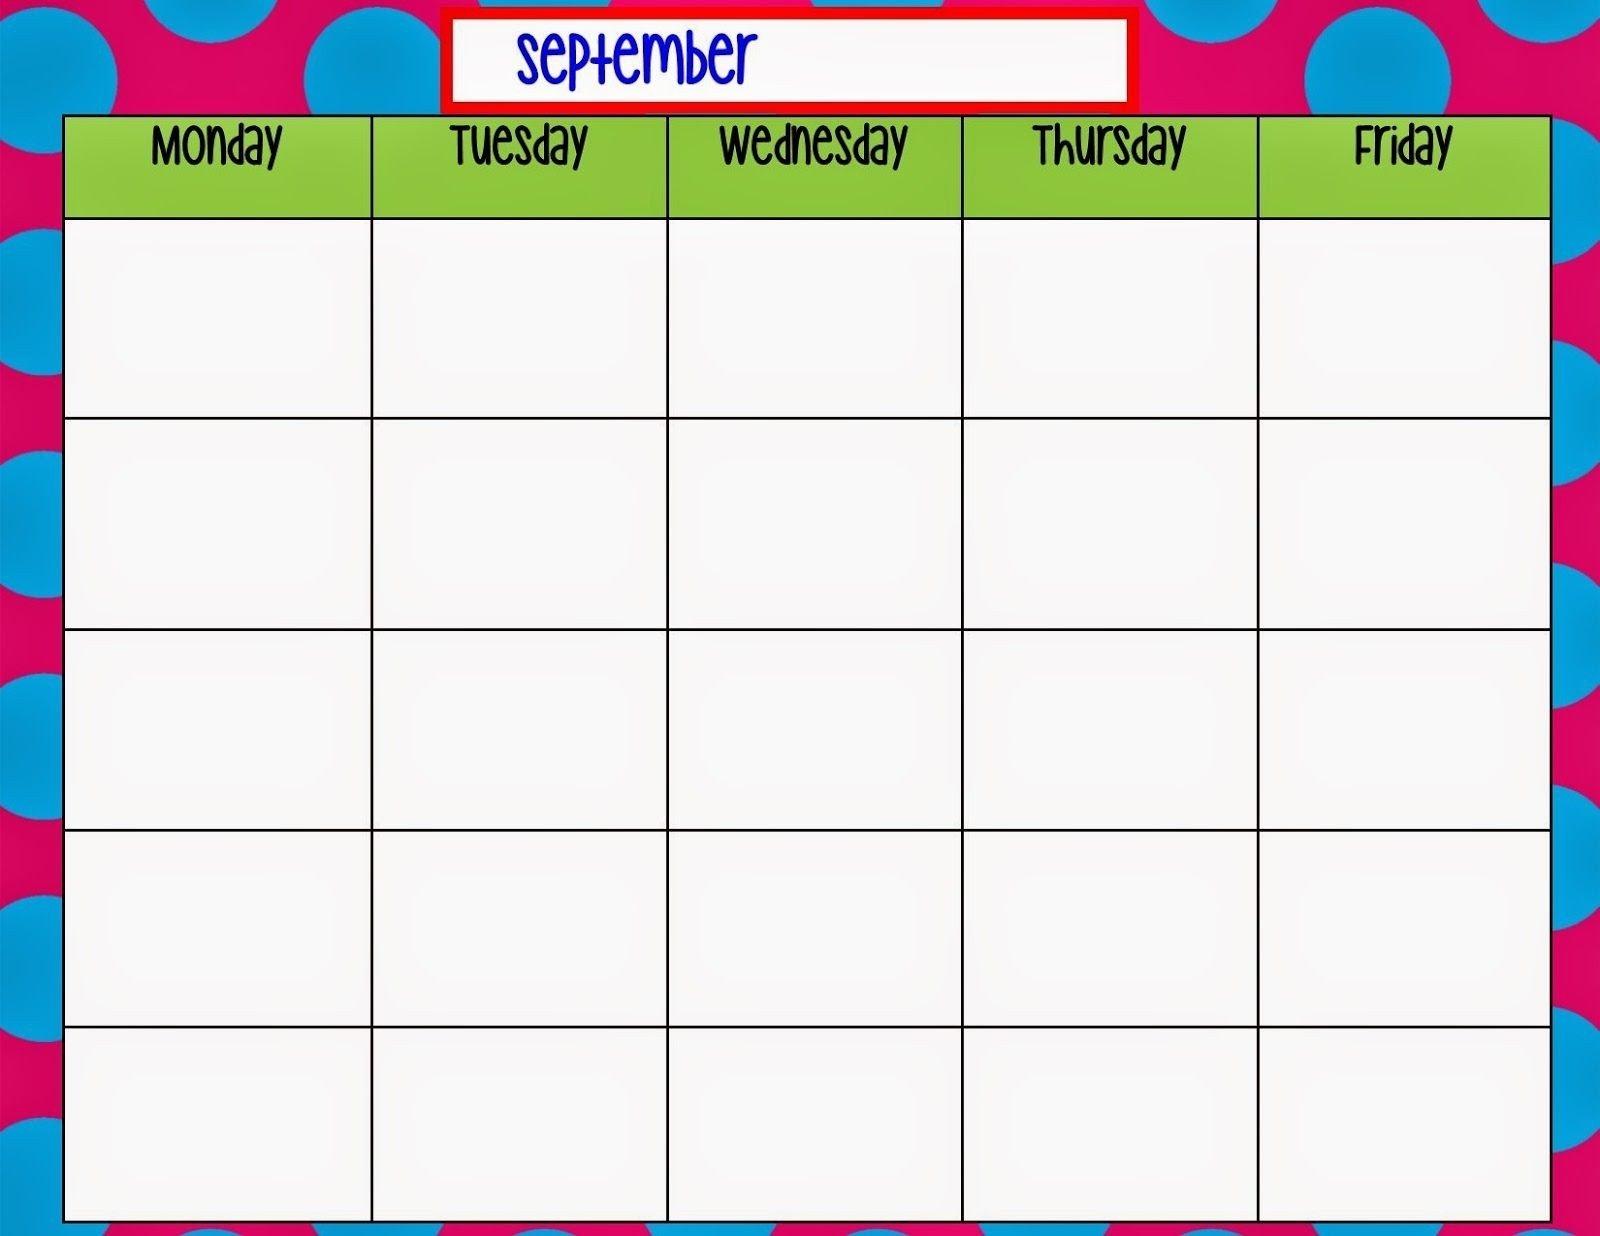 Monday To Friday Template | Calendar Template Printable This Week Monday To Friday Printable Calendar